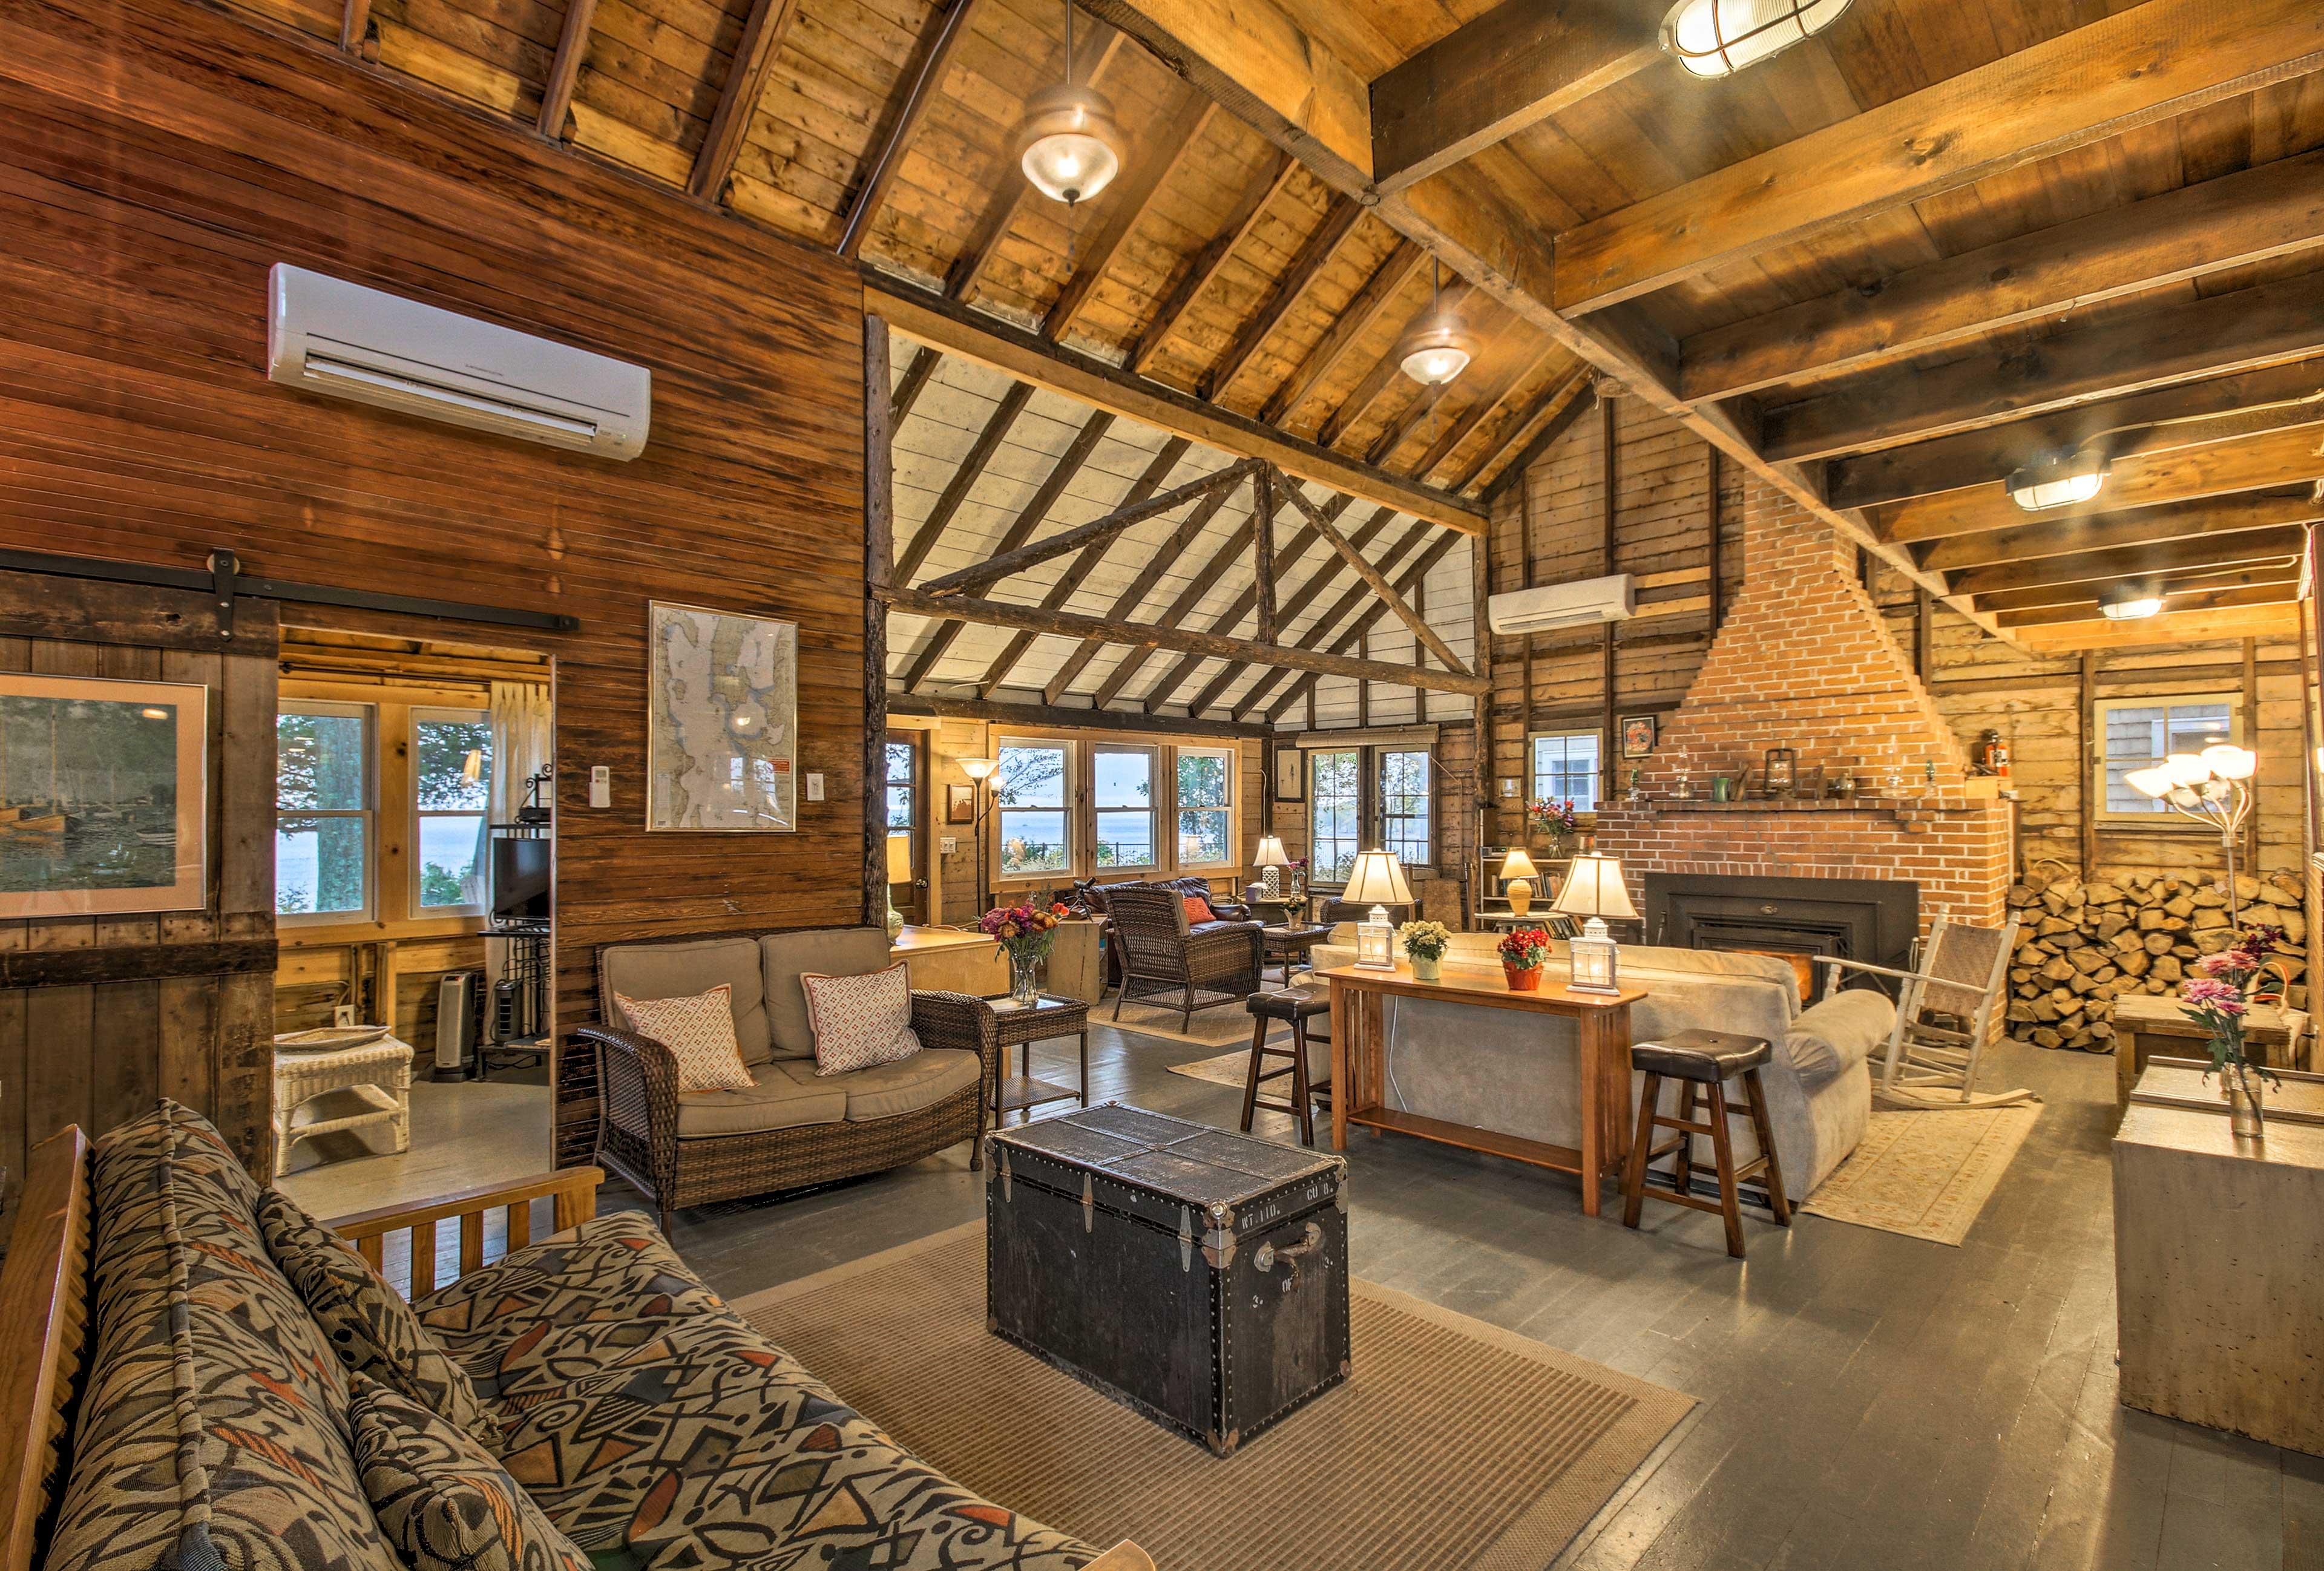 The remarkable wood furnishings enhance the homes rustic, elegant feel.